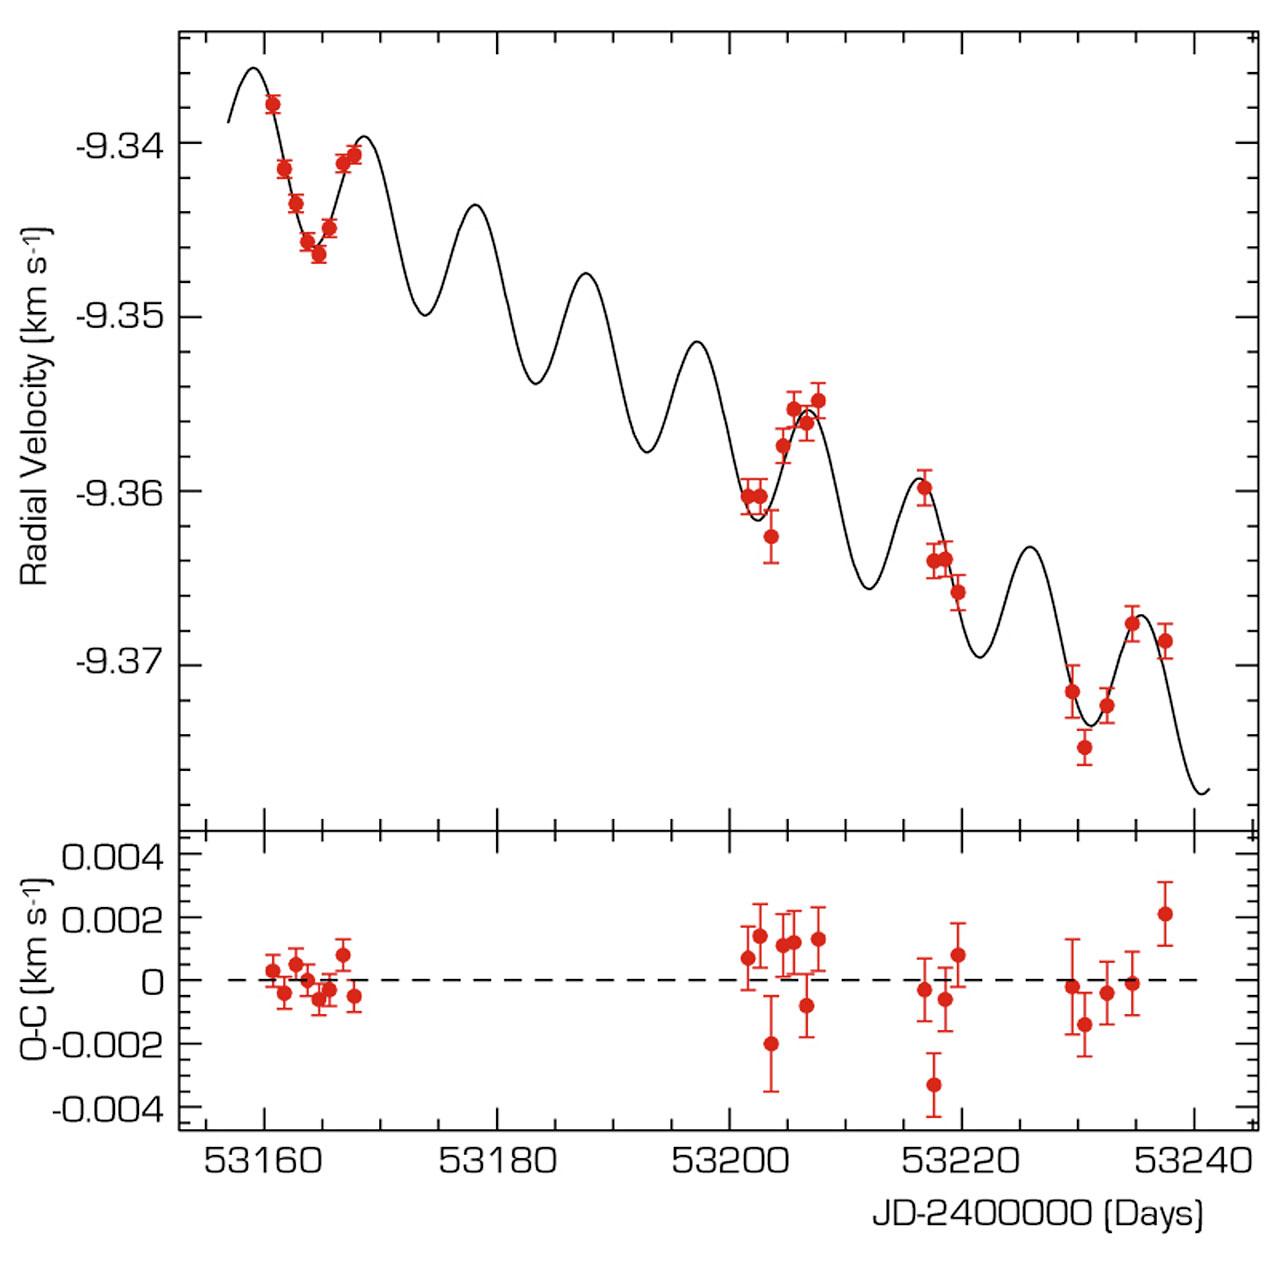 Velocity Variation of mu Arae Observed by HARPS